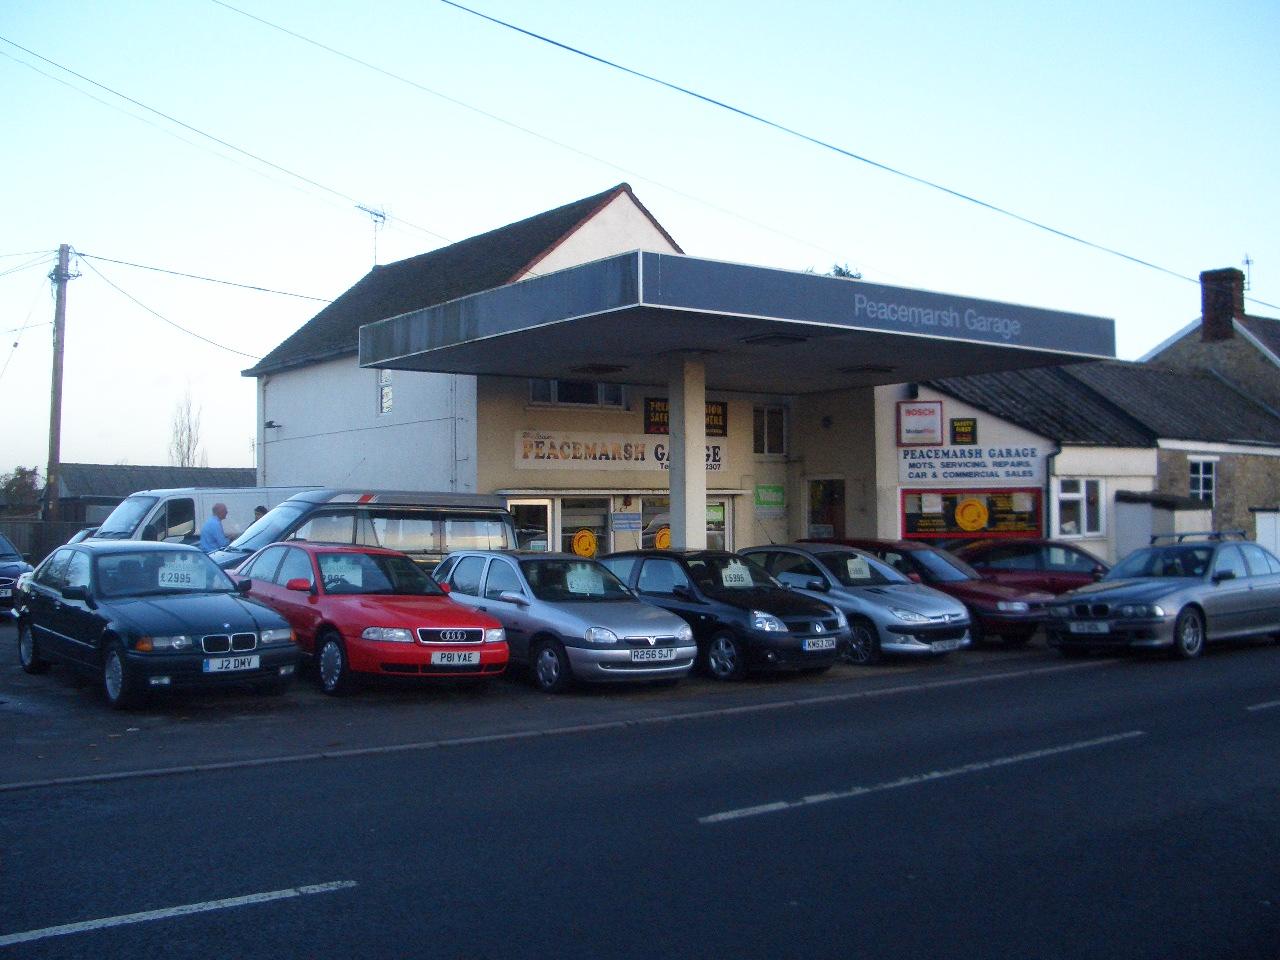 Peacemarsh Garage - MOTs, Sevicing, Used Car Sales, Repairs, Buy Car ...